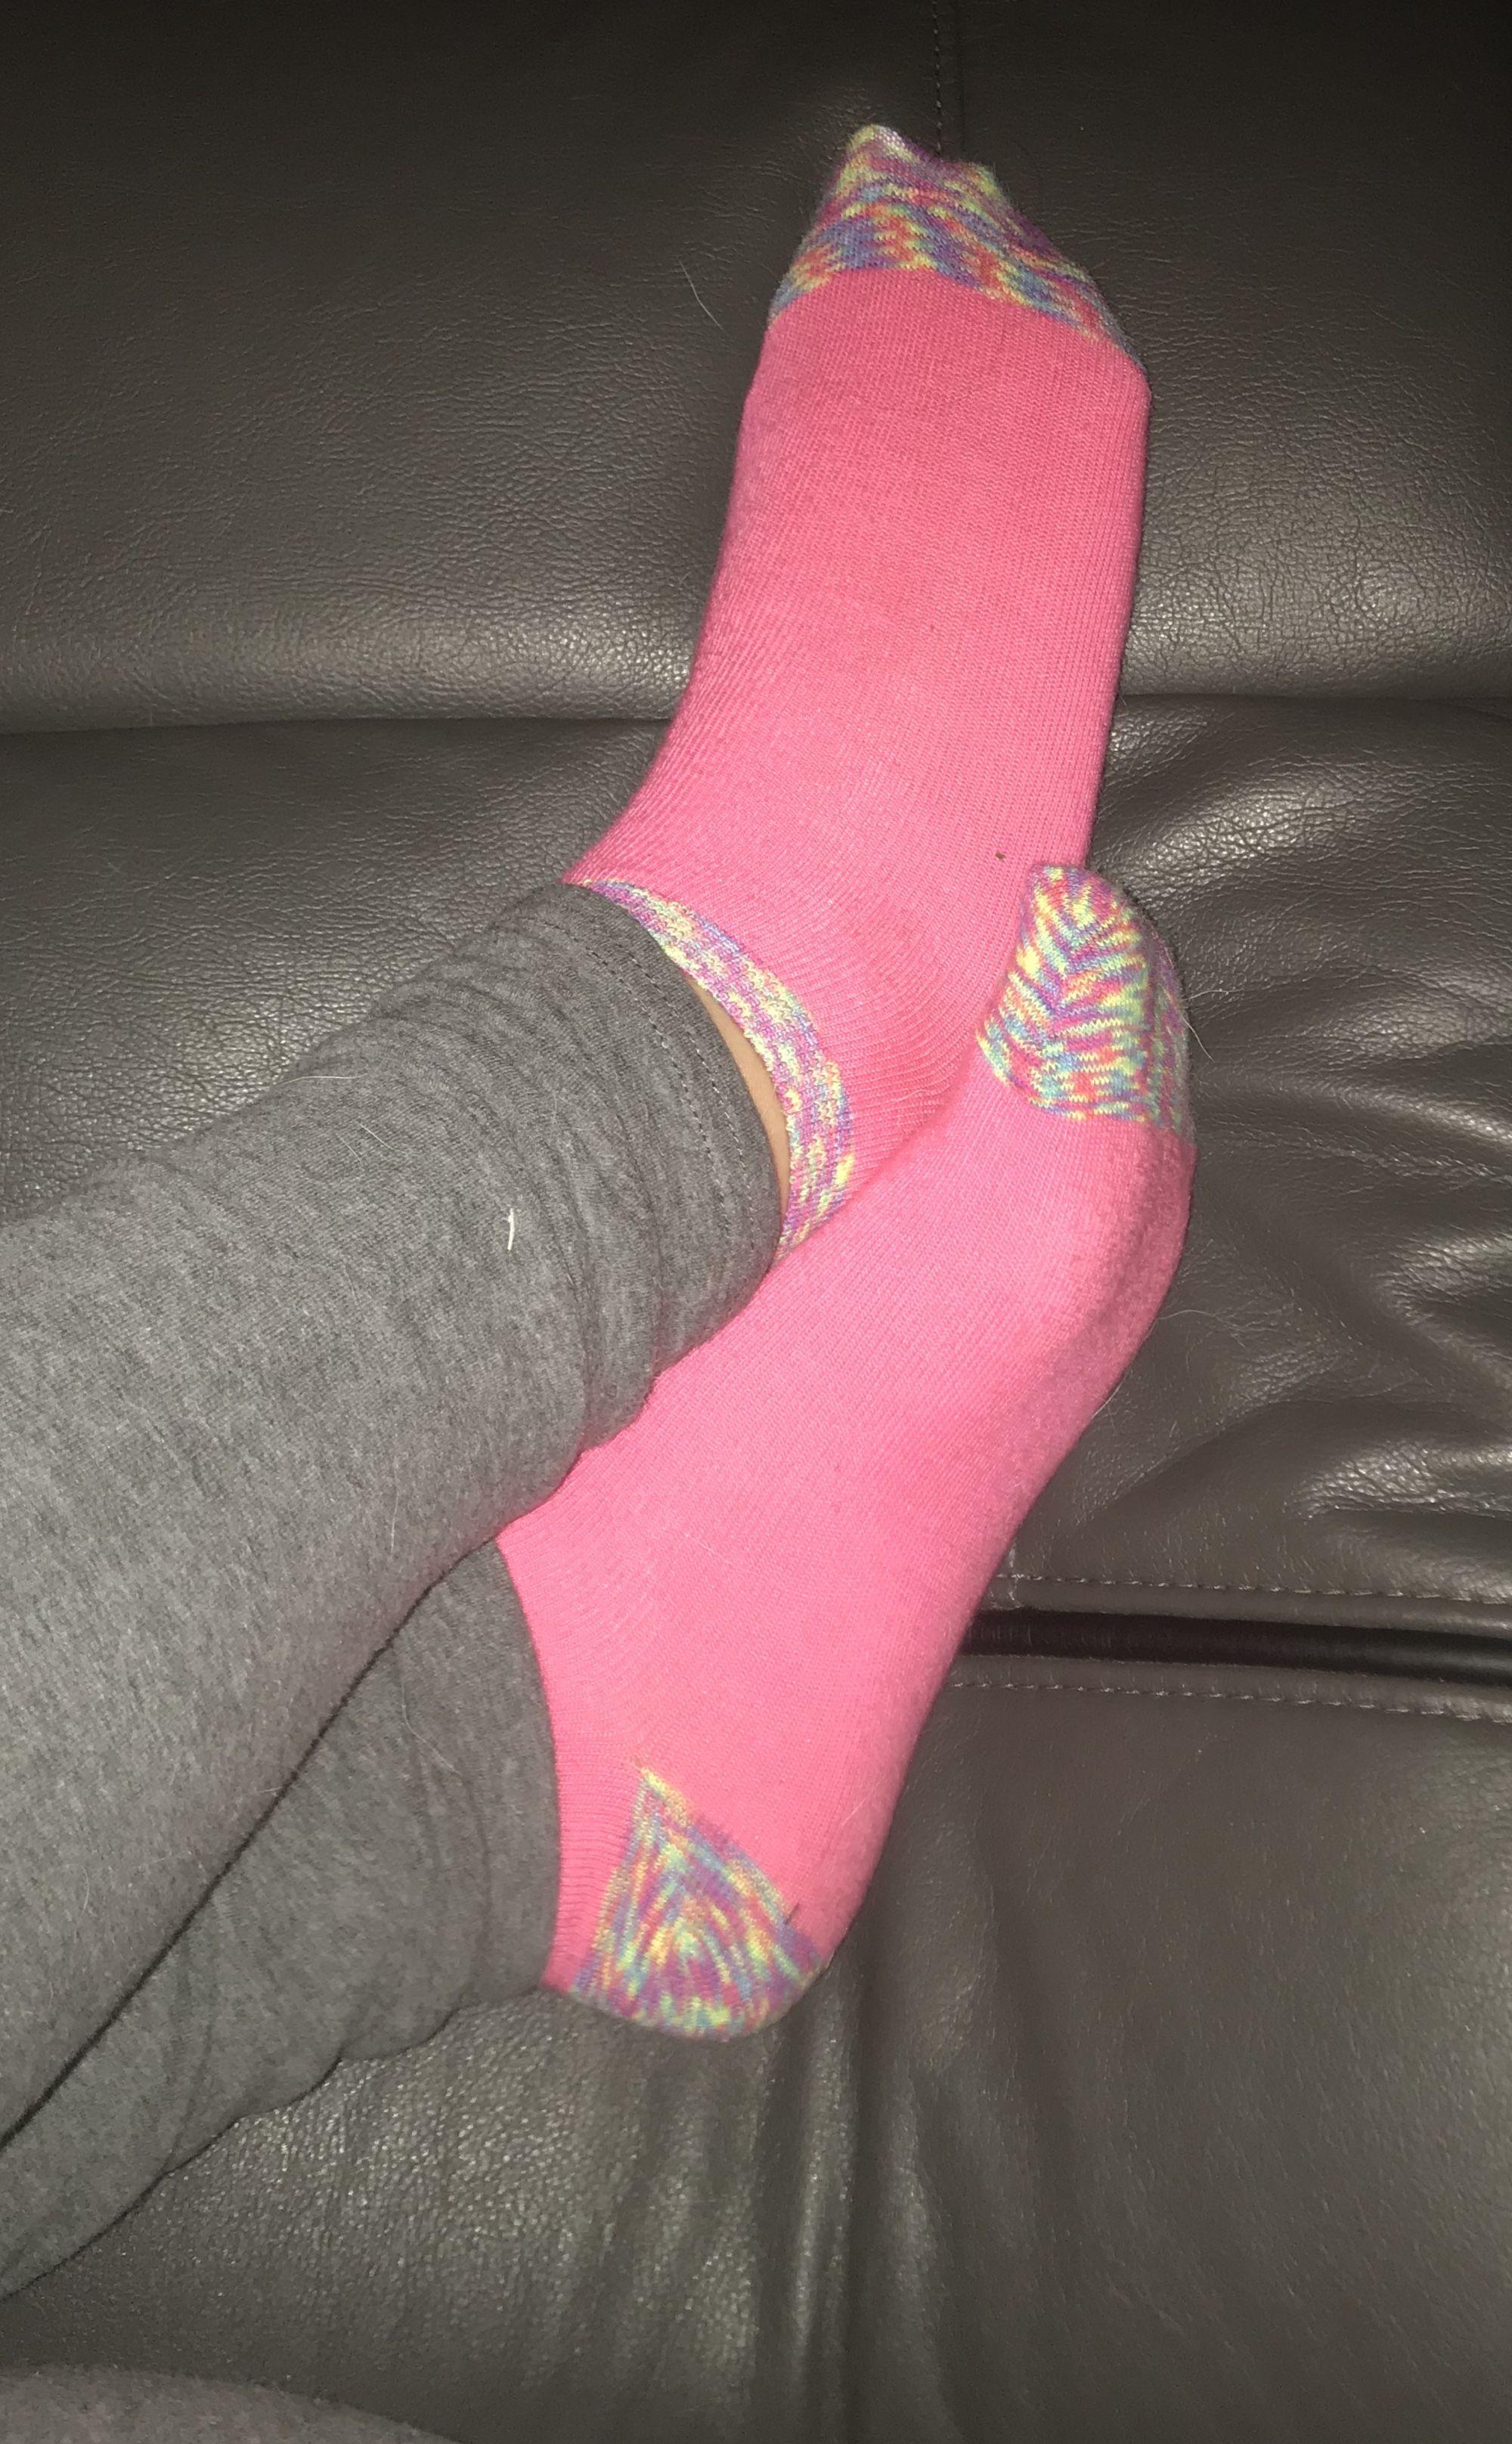 Pin by Dana on socks   Girls ankle socks, Frilly socks